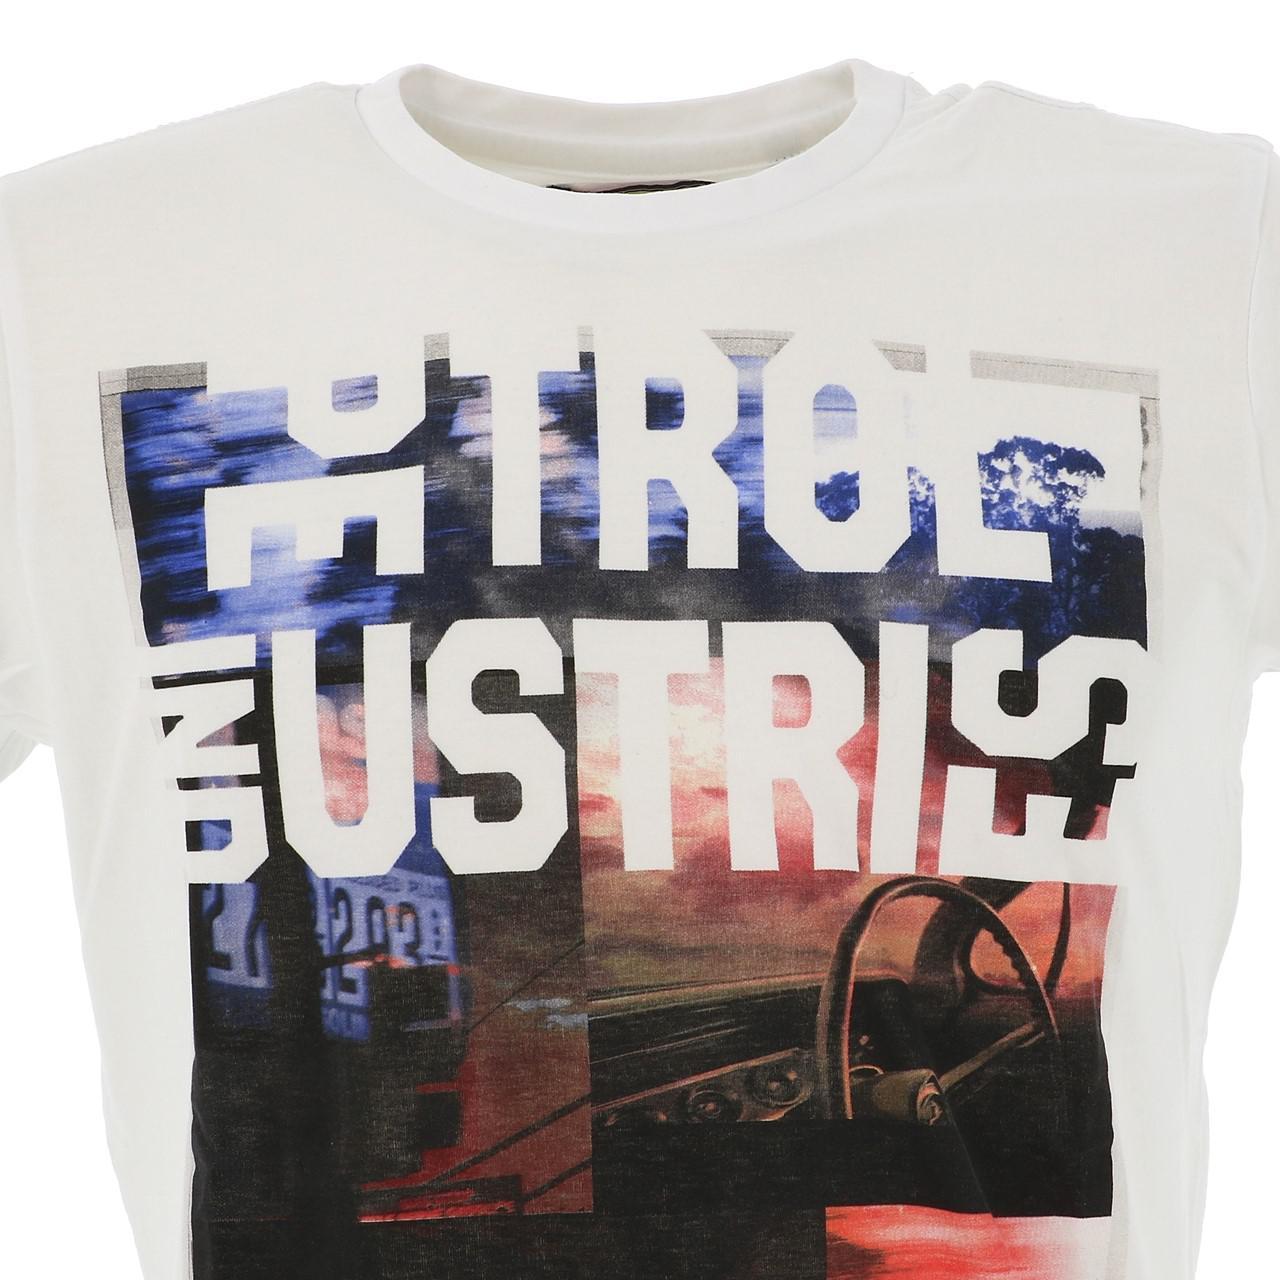 Short-Sleeve-T-Shirt-Petrol-Industries-Tsr618-Bright-White-Tee-White-18081 thumbnail 2